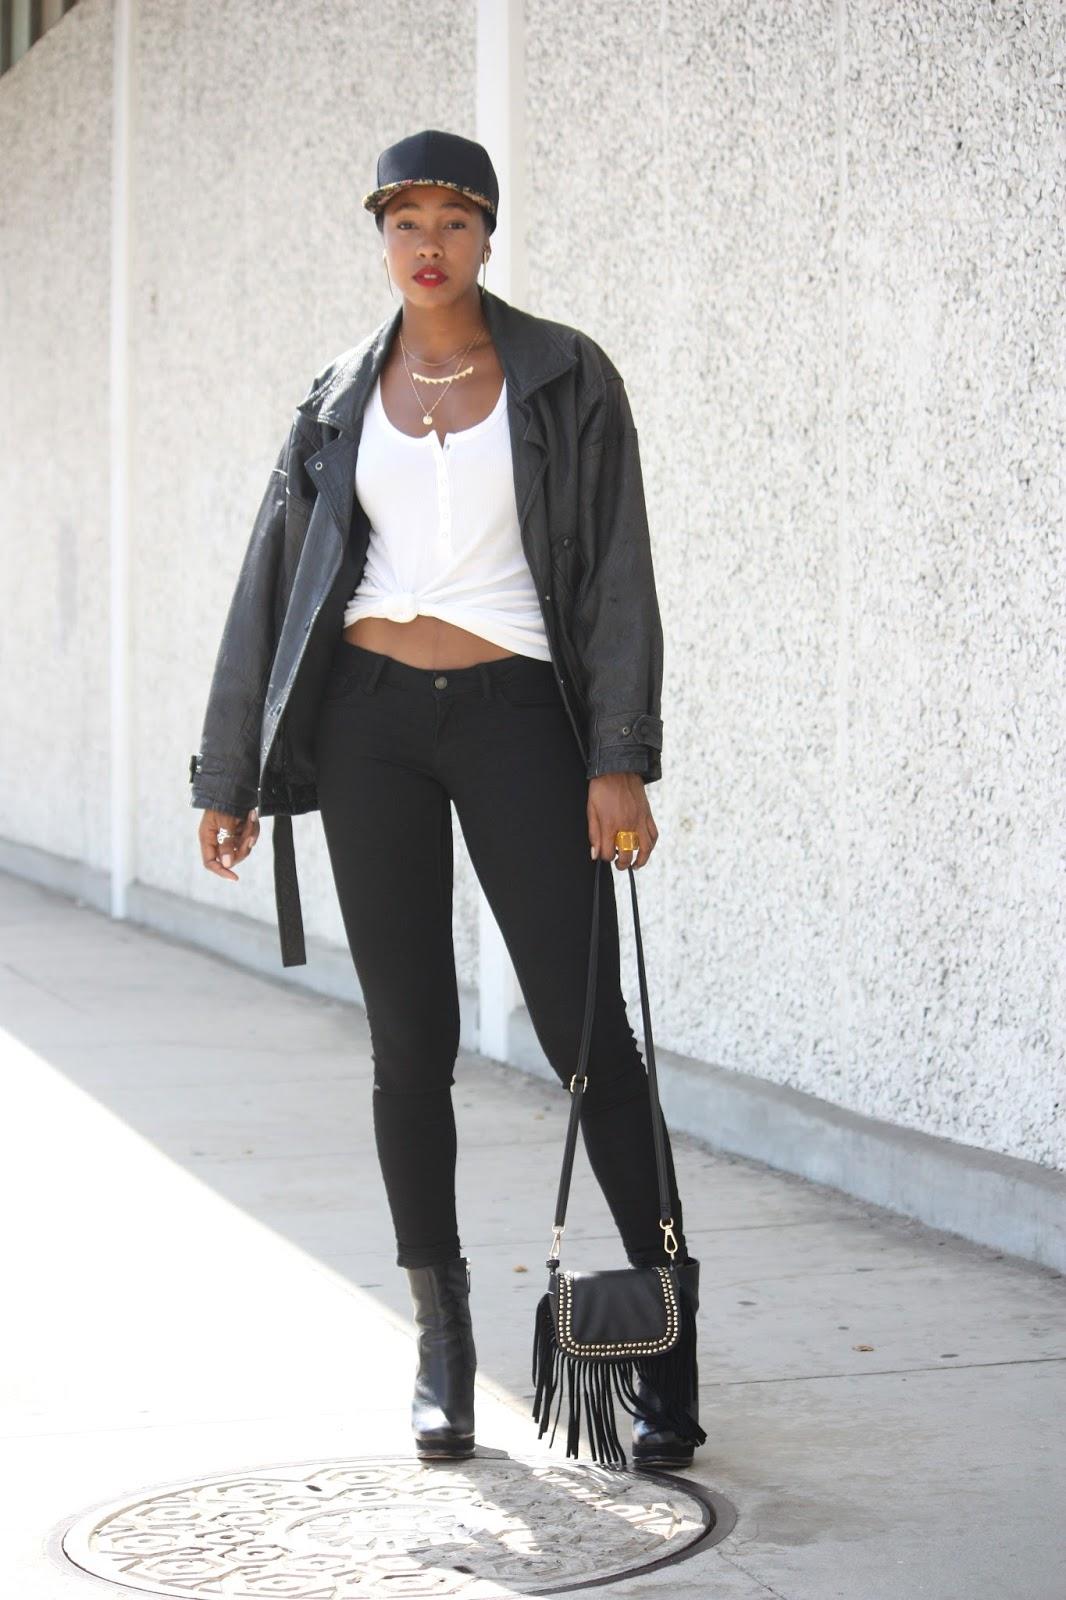 Fashion blogger spring ootd